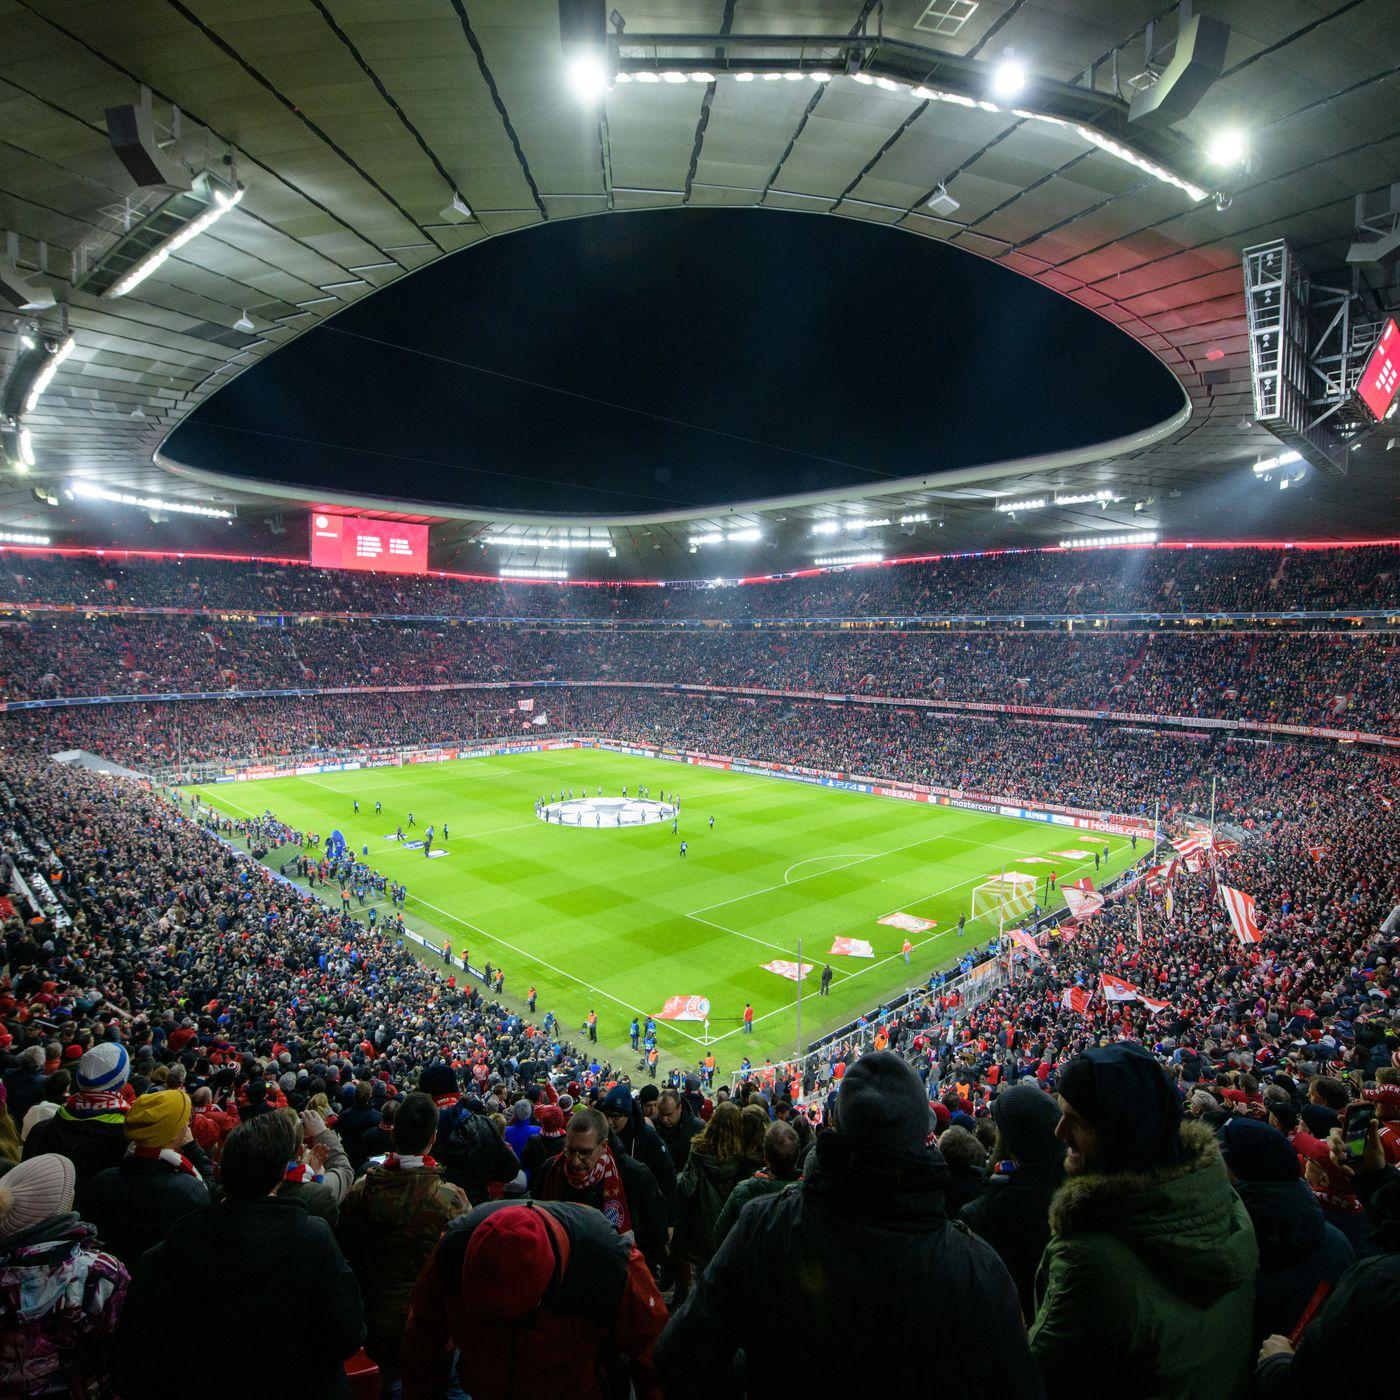 report munich to host 2022 uefa champions league final bavarian football works host 2022 uefa champions league final